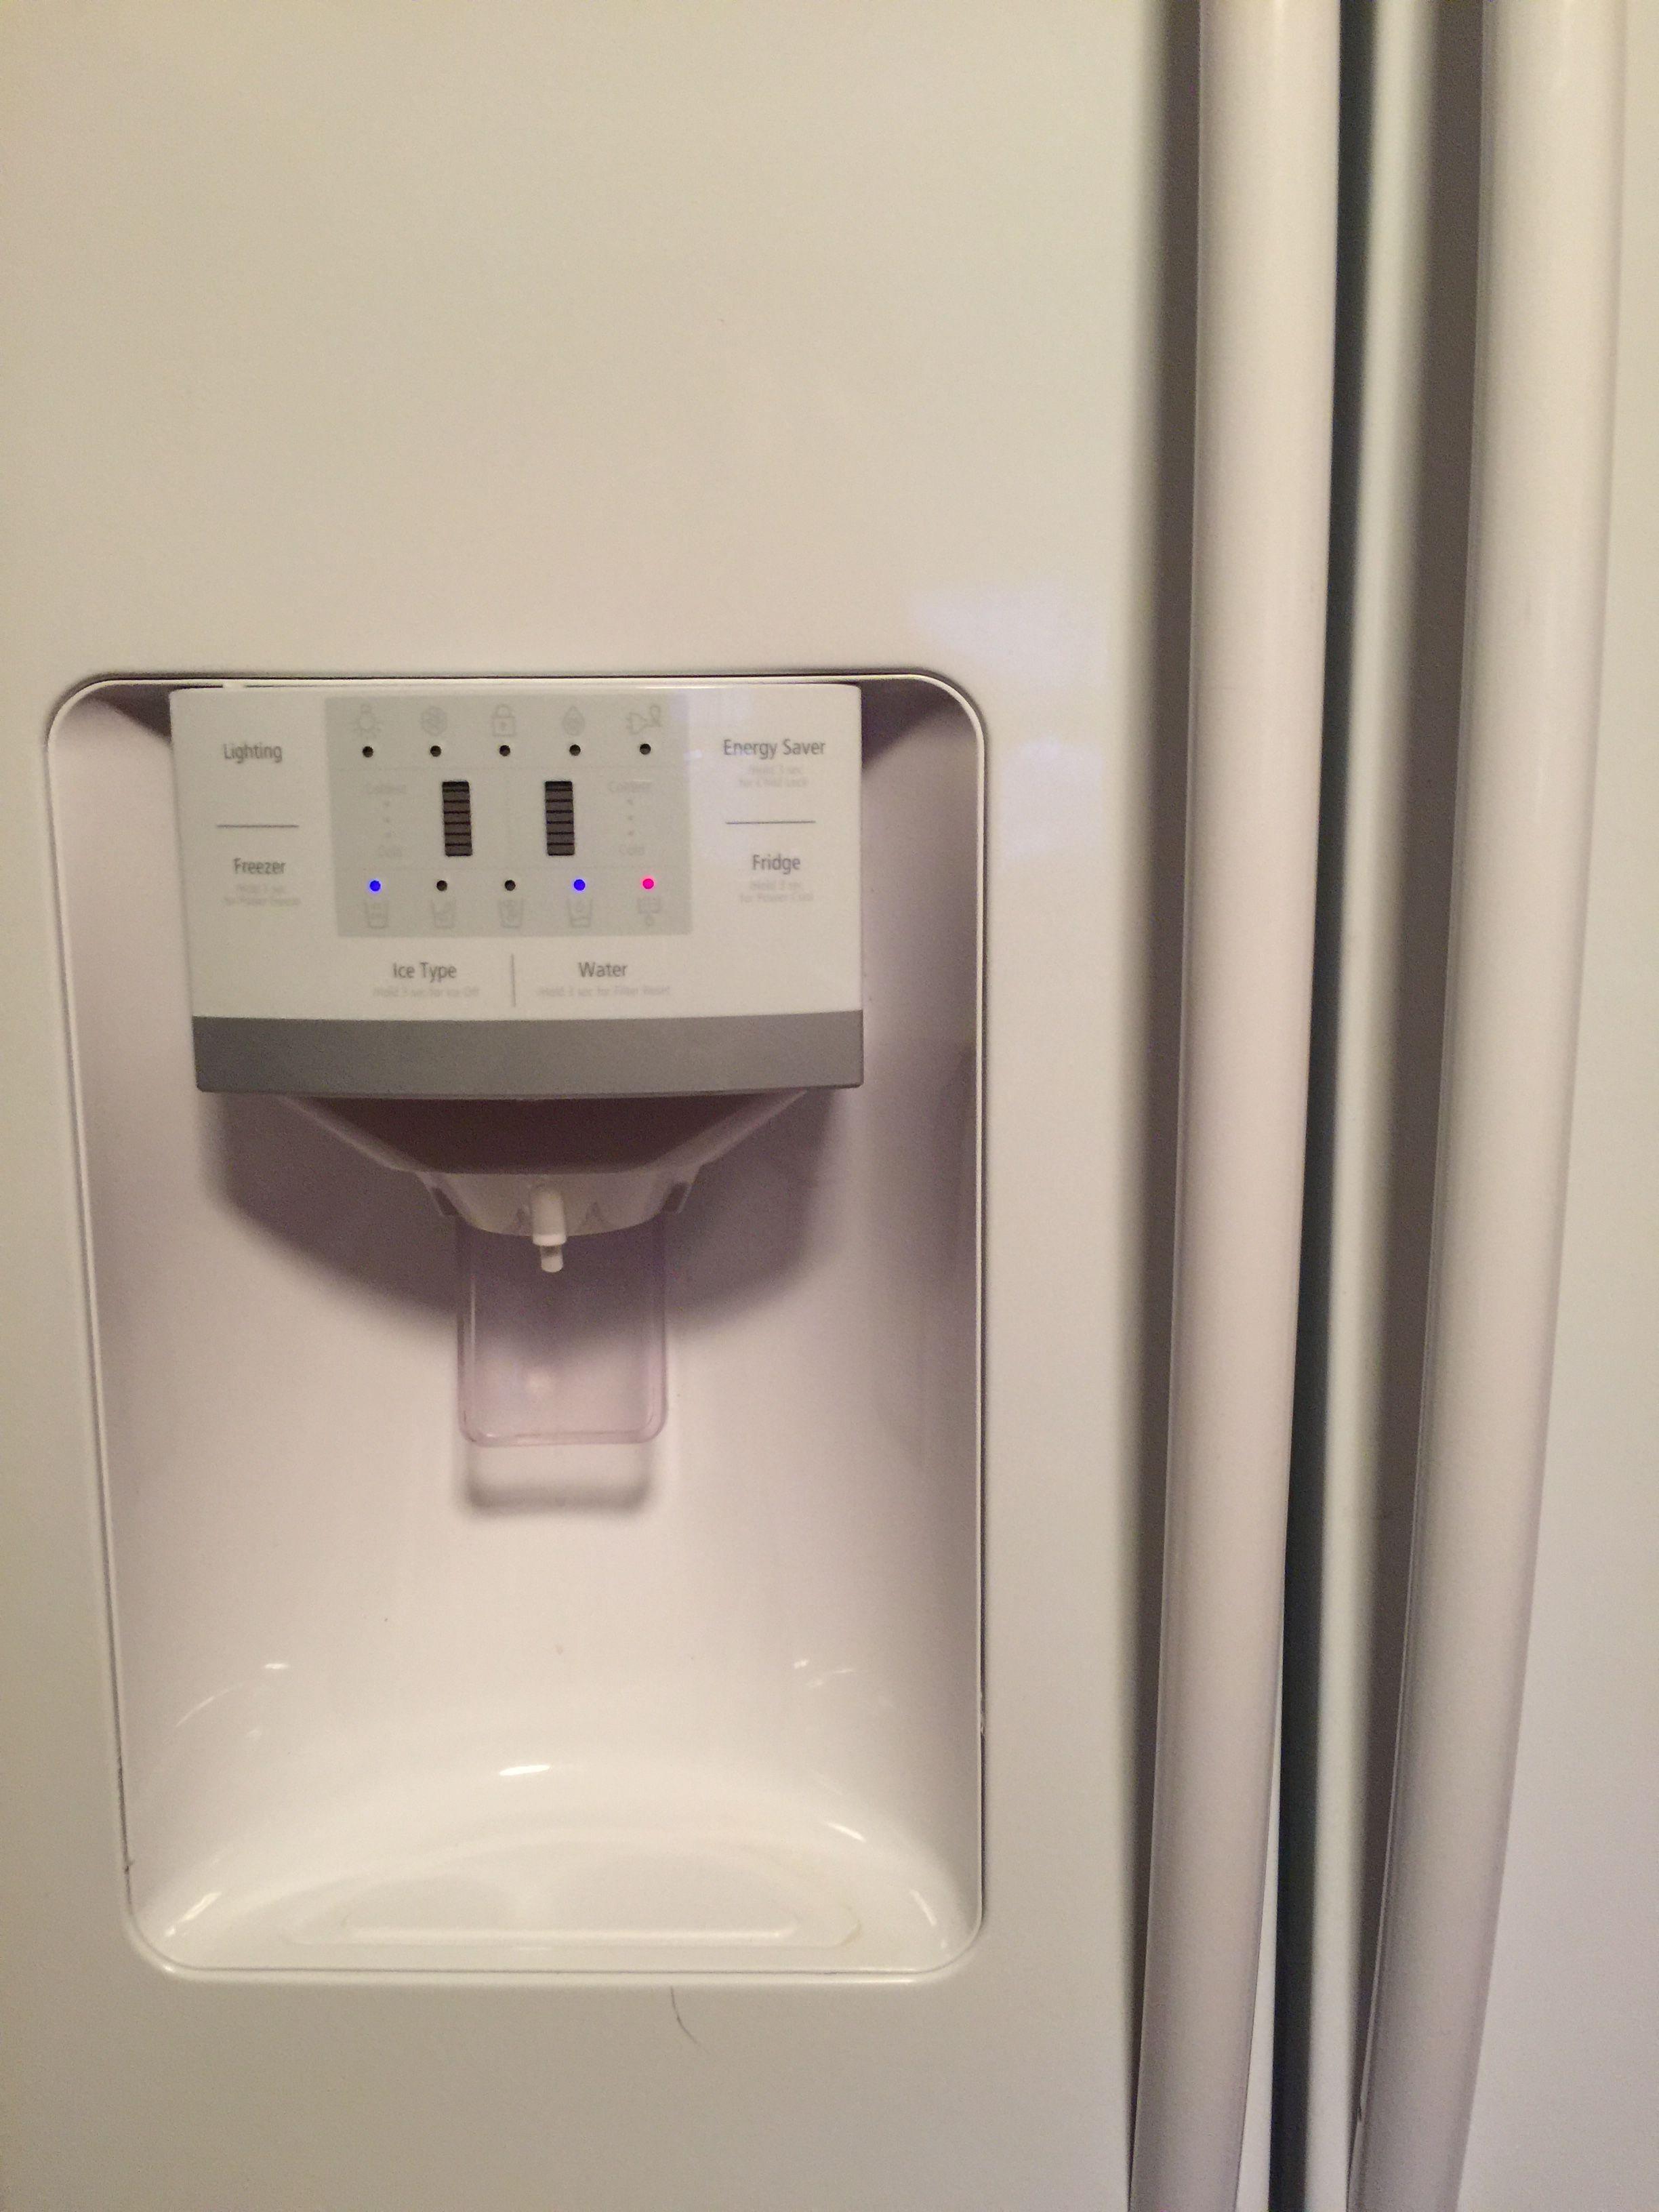 Icewater dispenser on fridge iphone image by fperkins